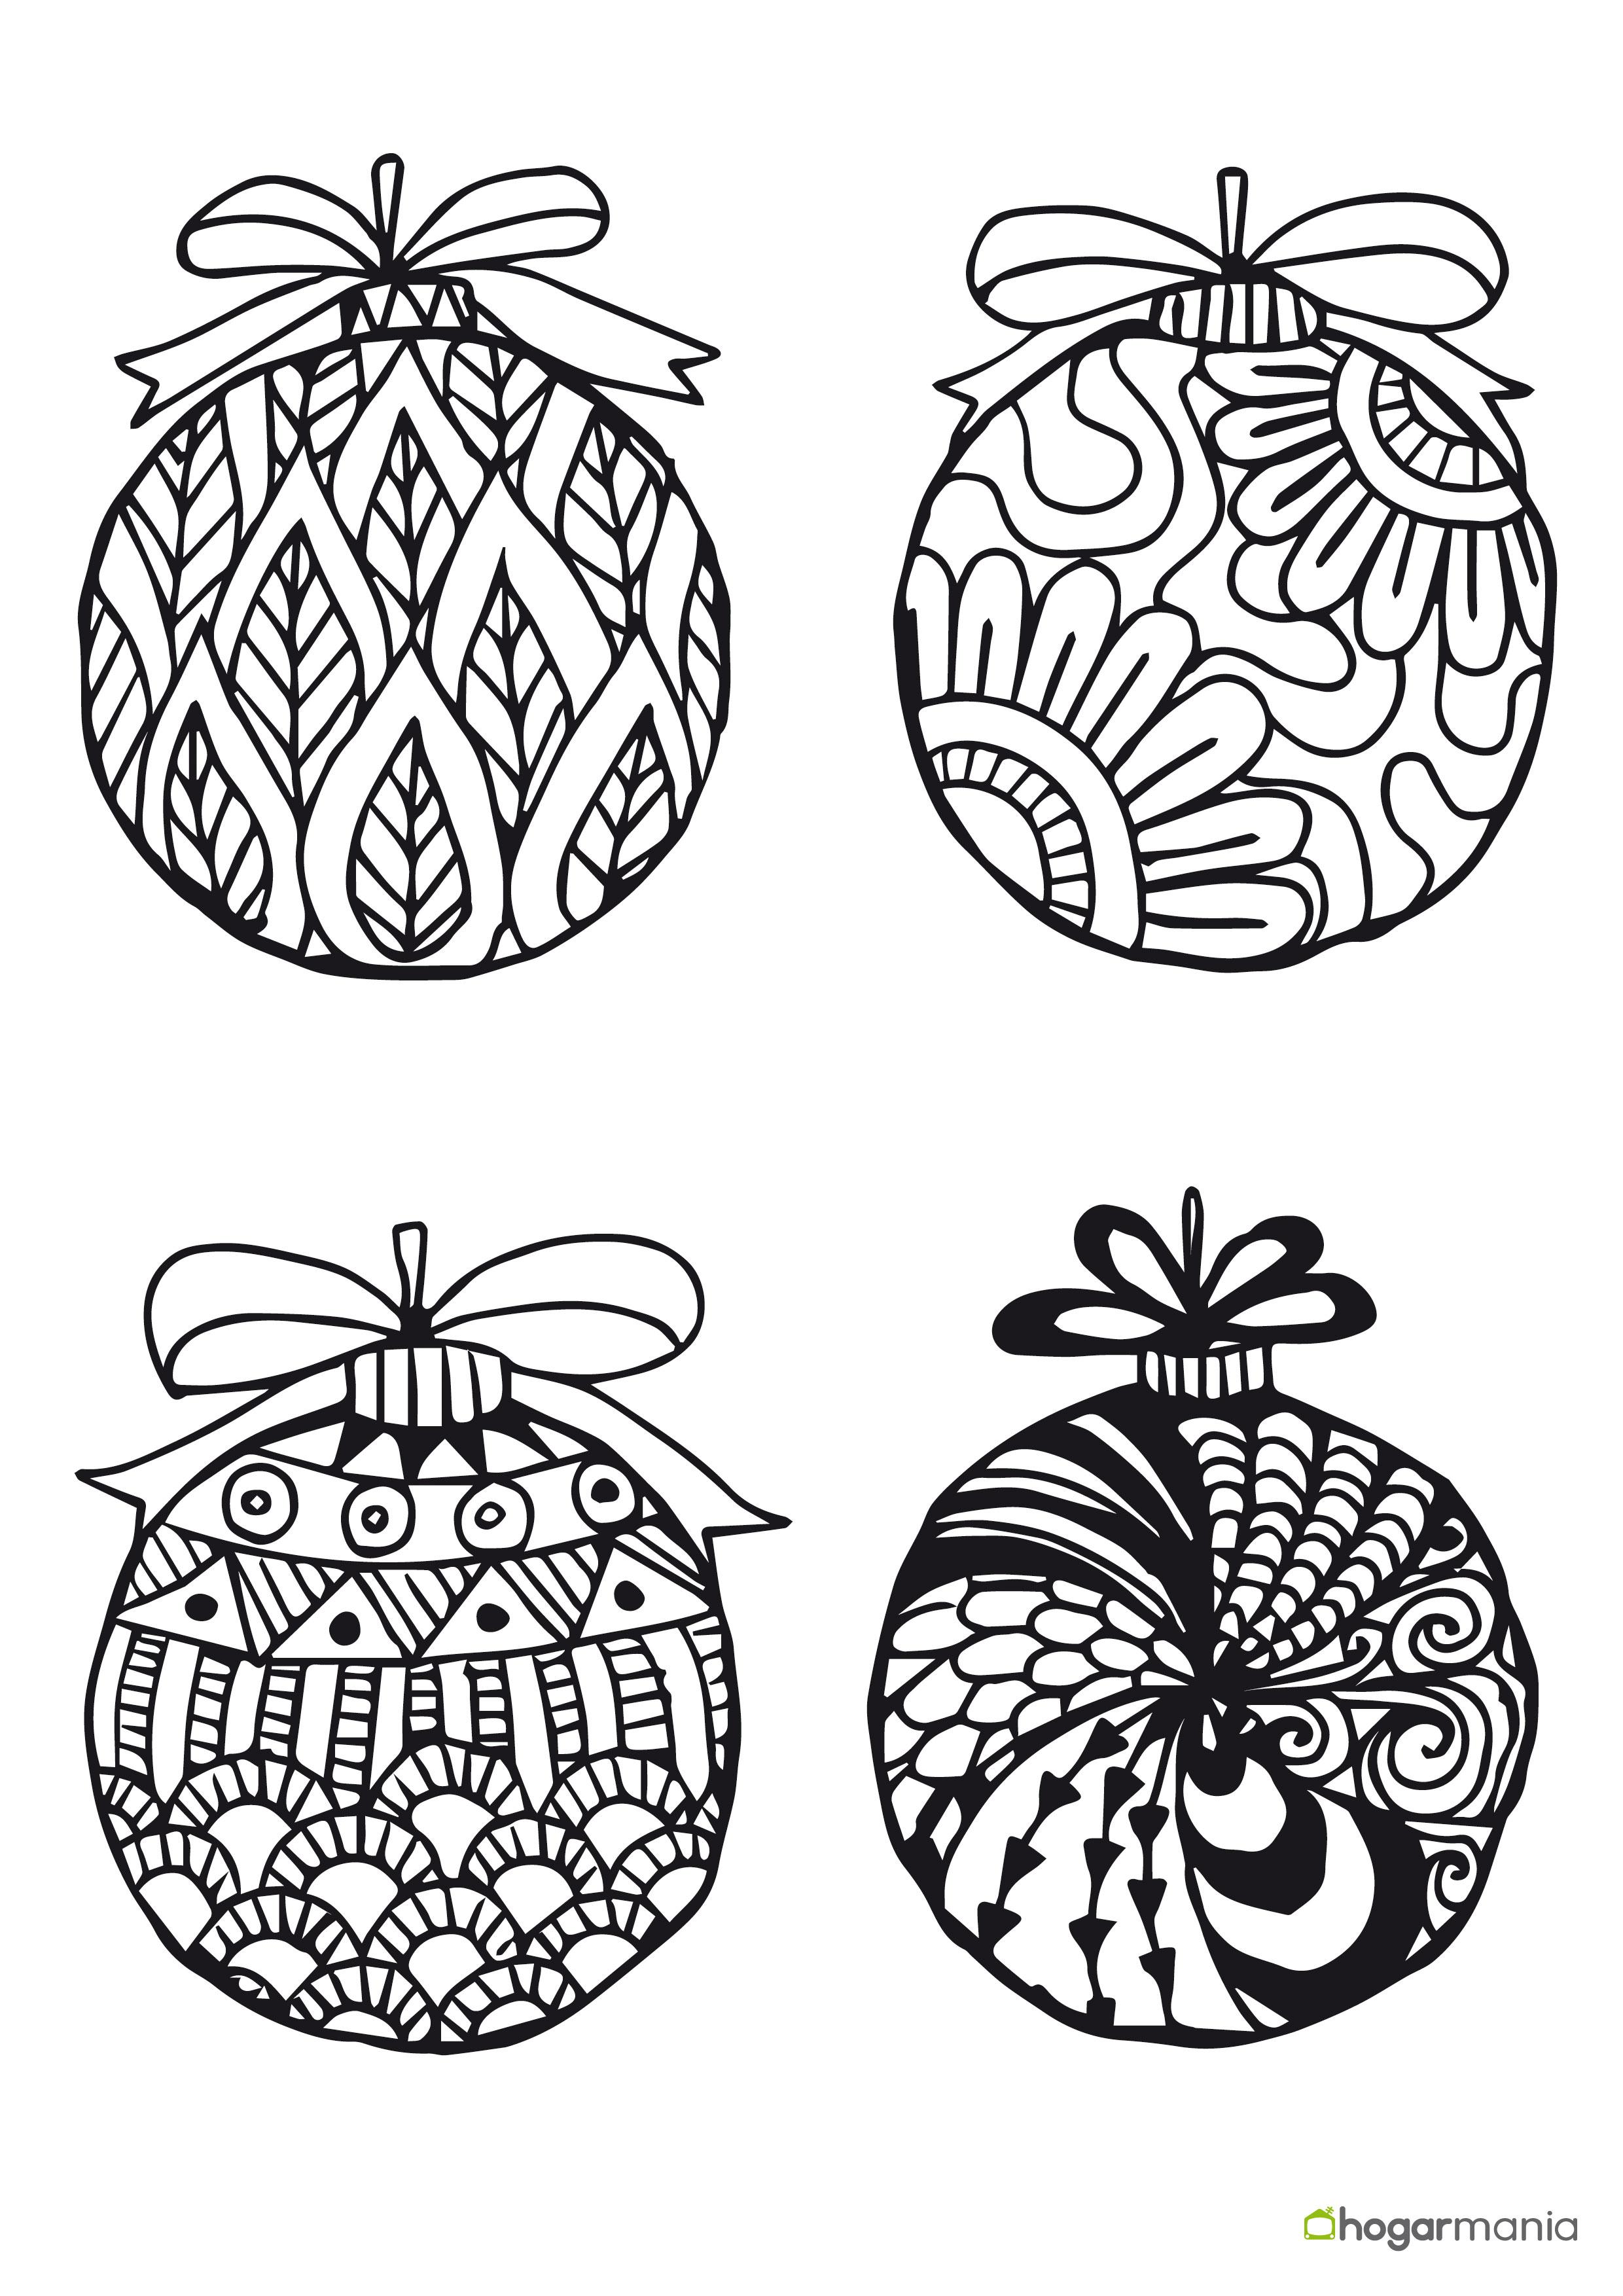 Inspirador dibujos de bolas de navidad para colorear e - Dibujos en color de navidad ...